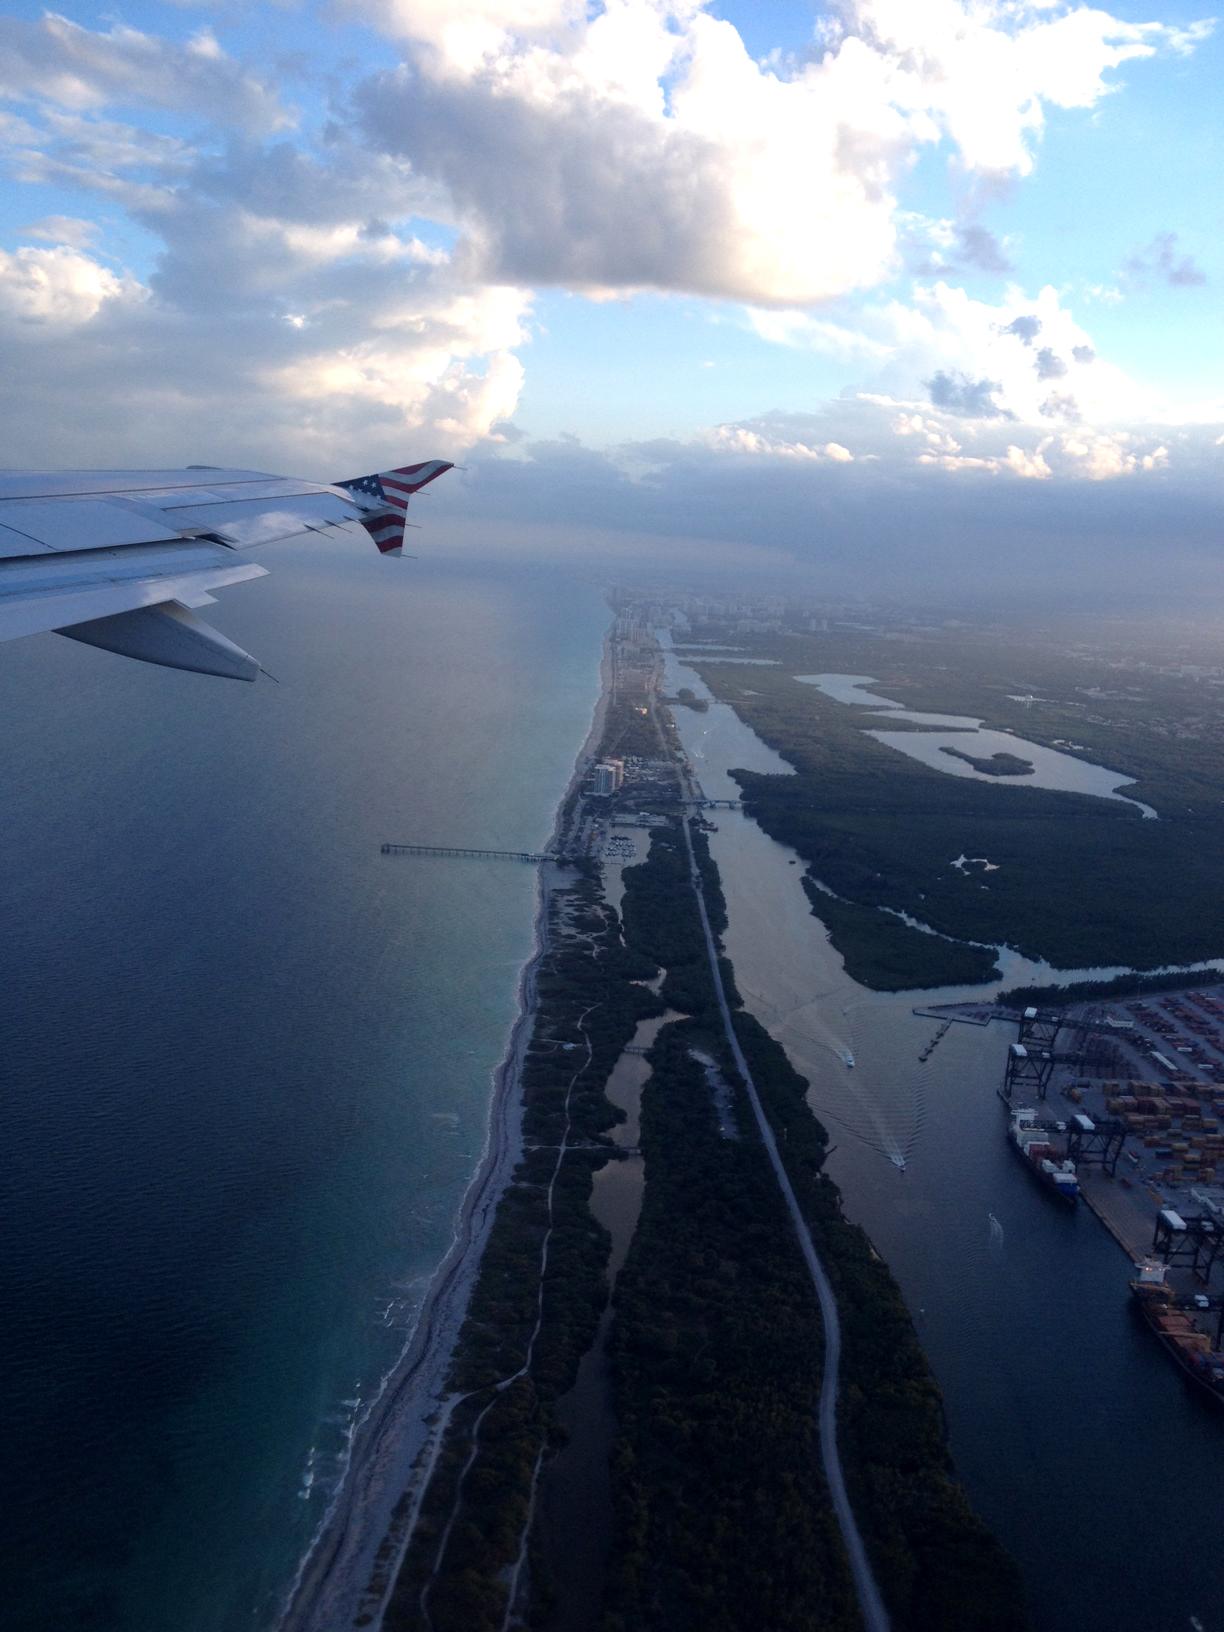 Miami plane.jpg